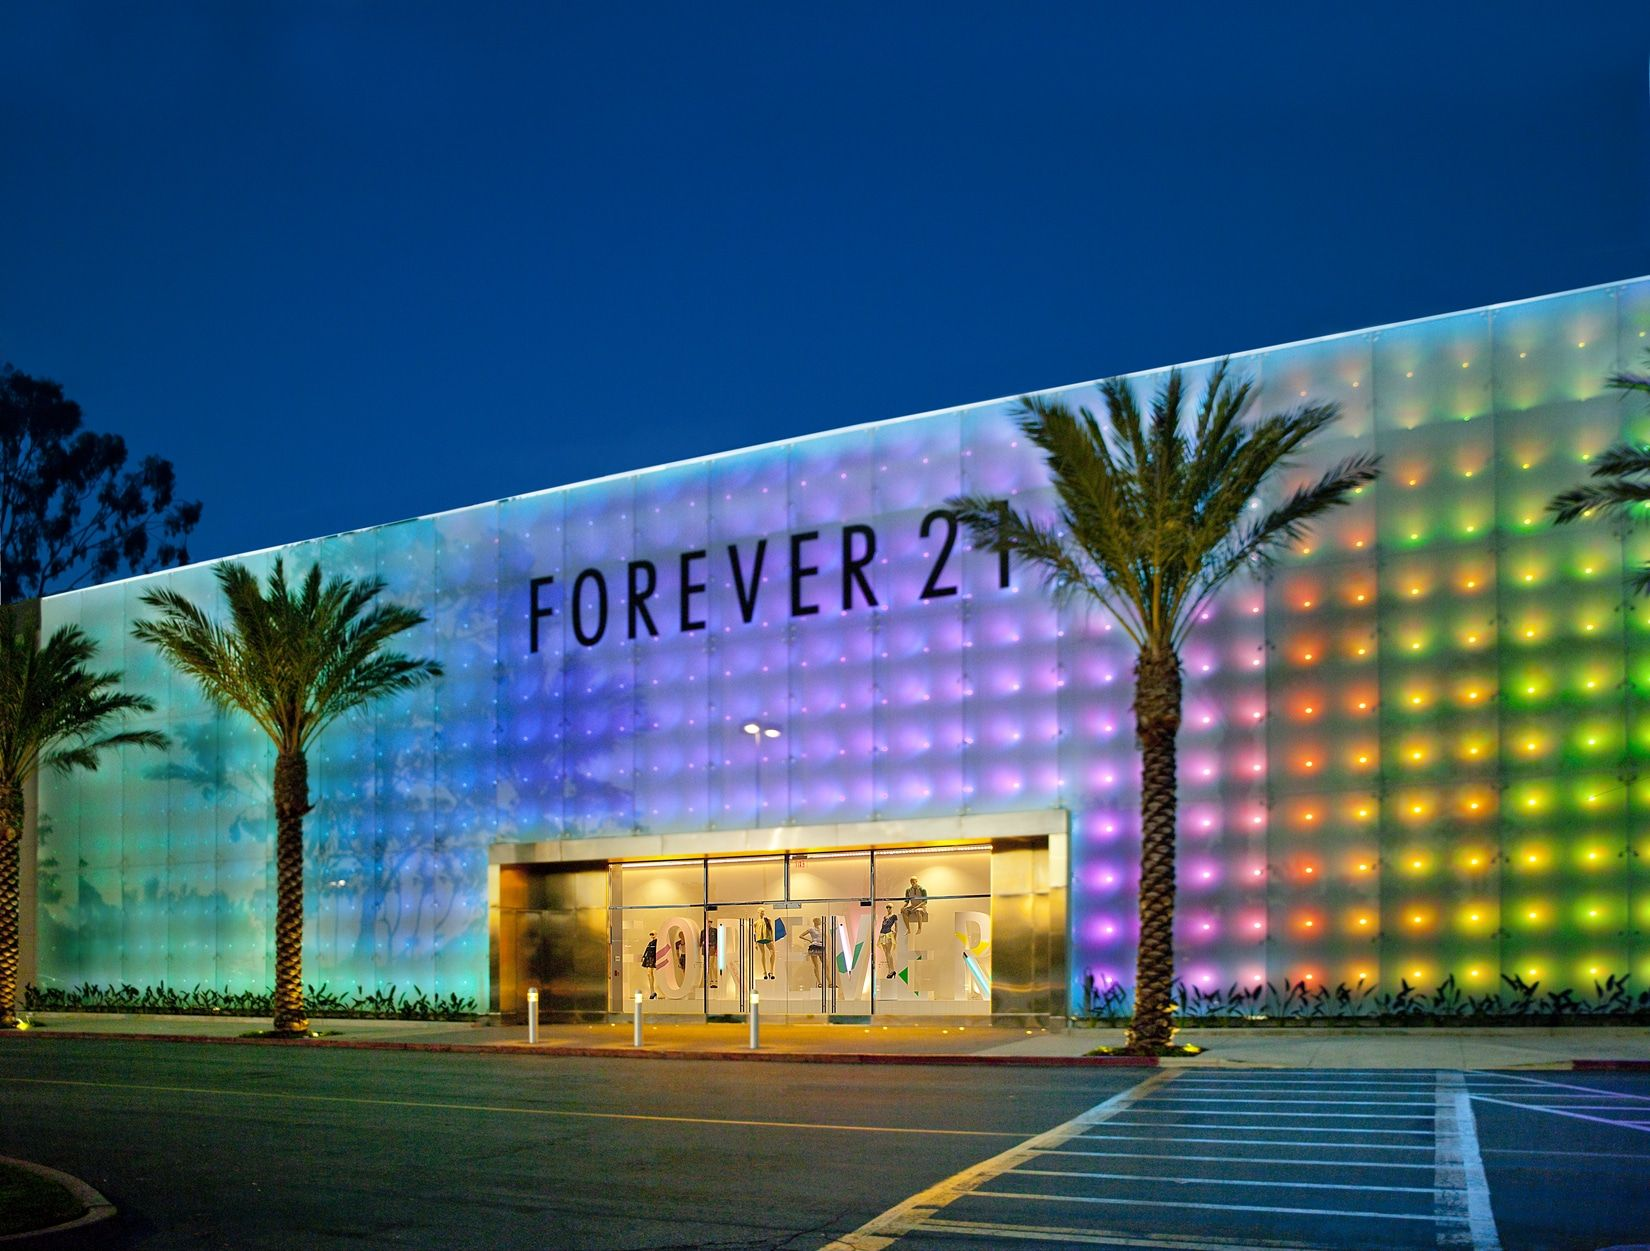 Forever 21 Sales Associate Sample Resume Amusing Lenie Broudic Leniebroudic On Pinterest